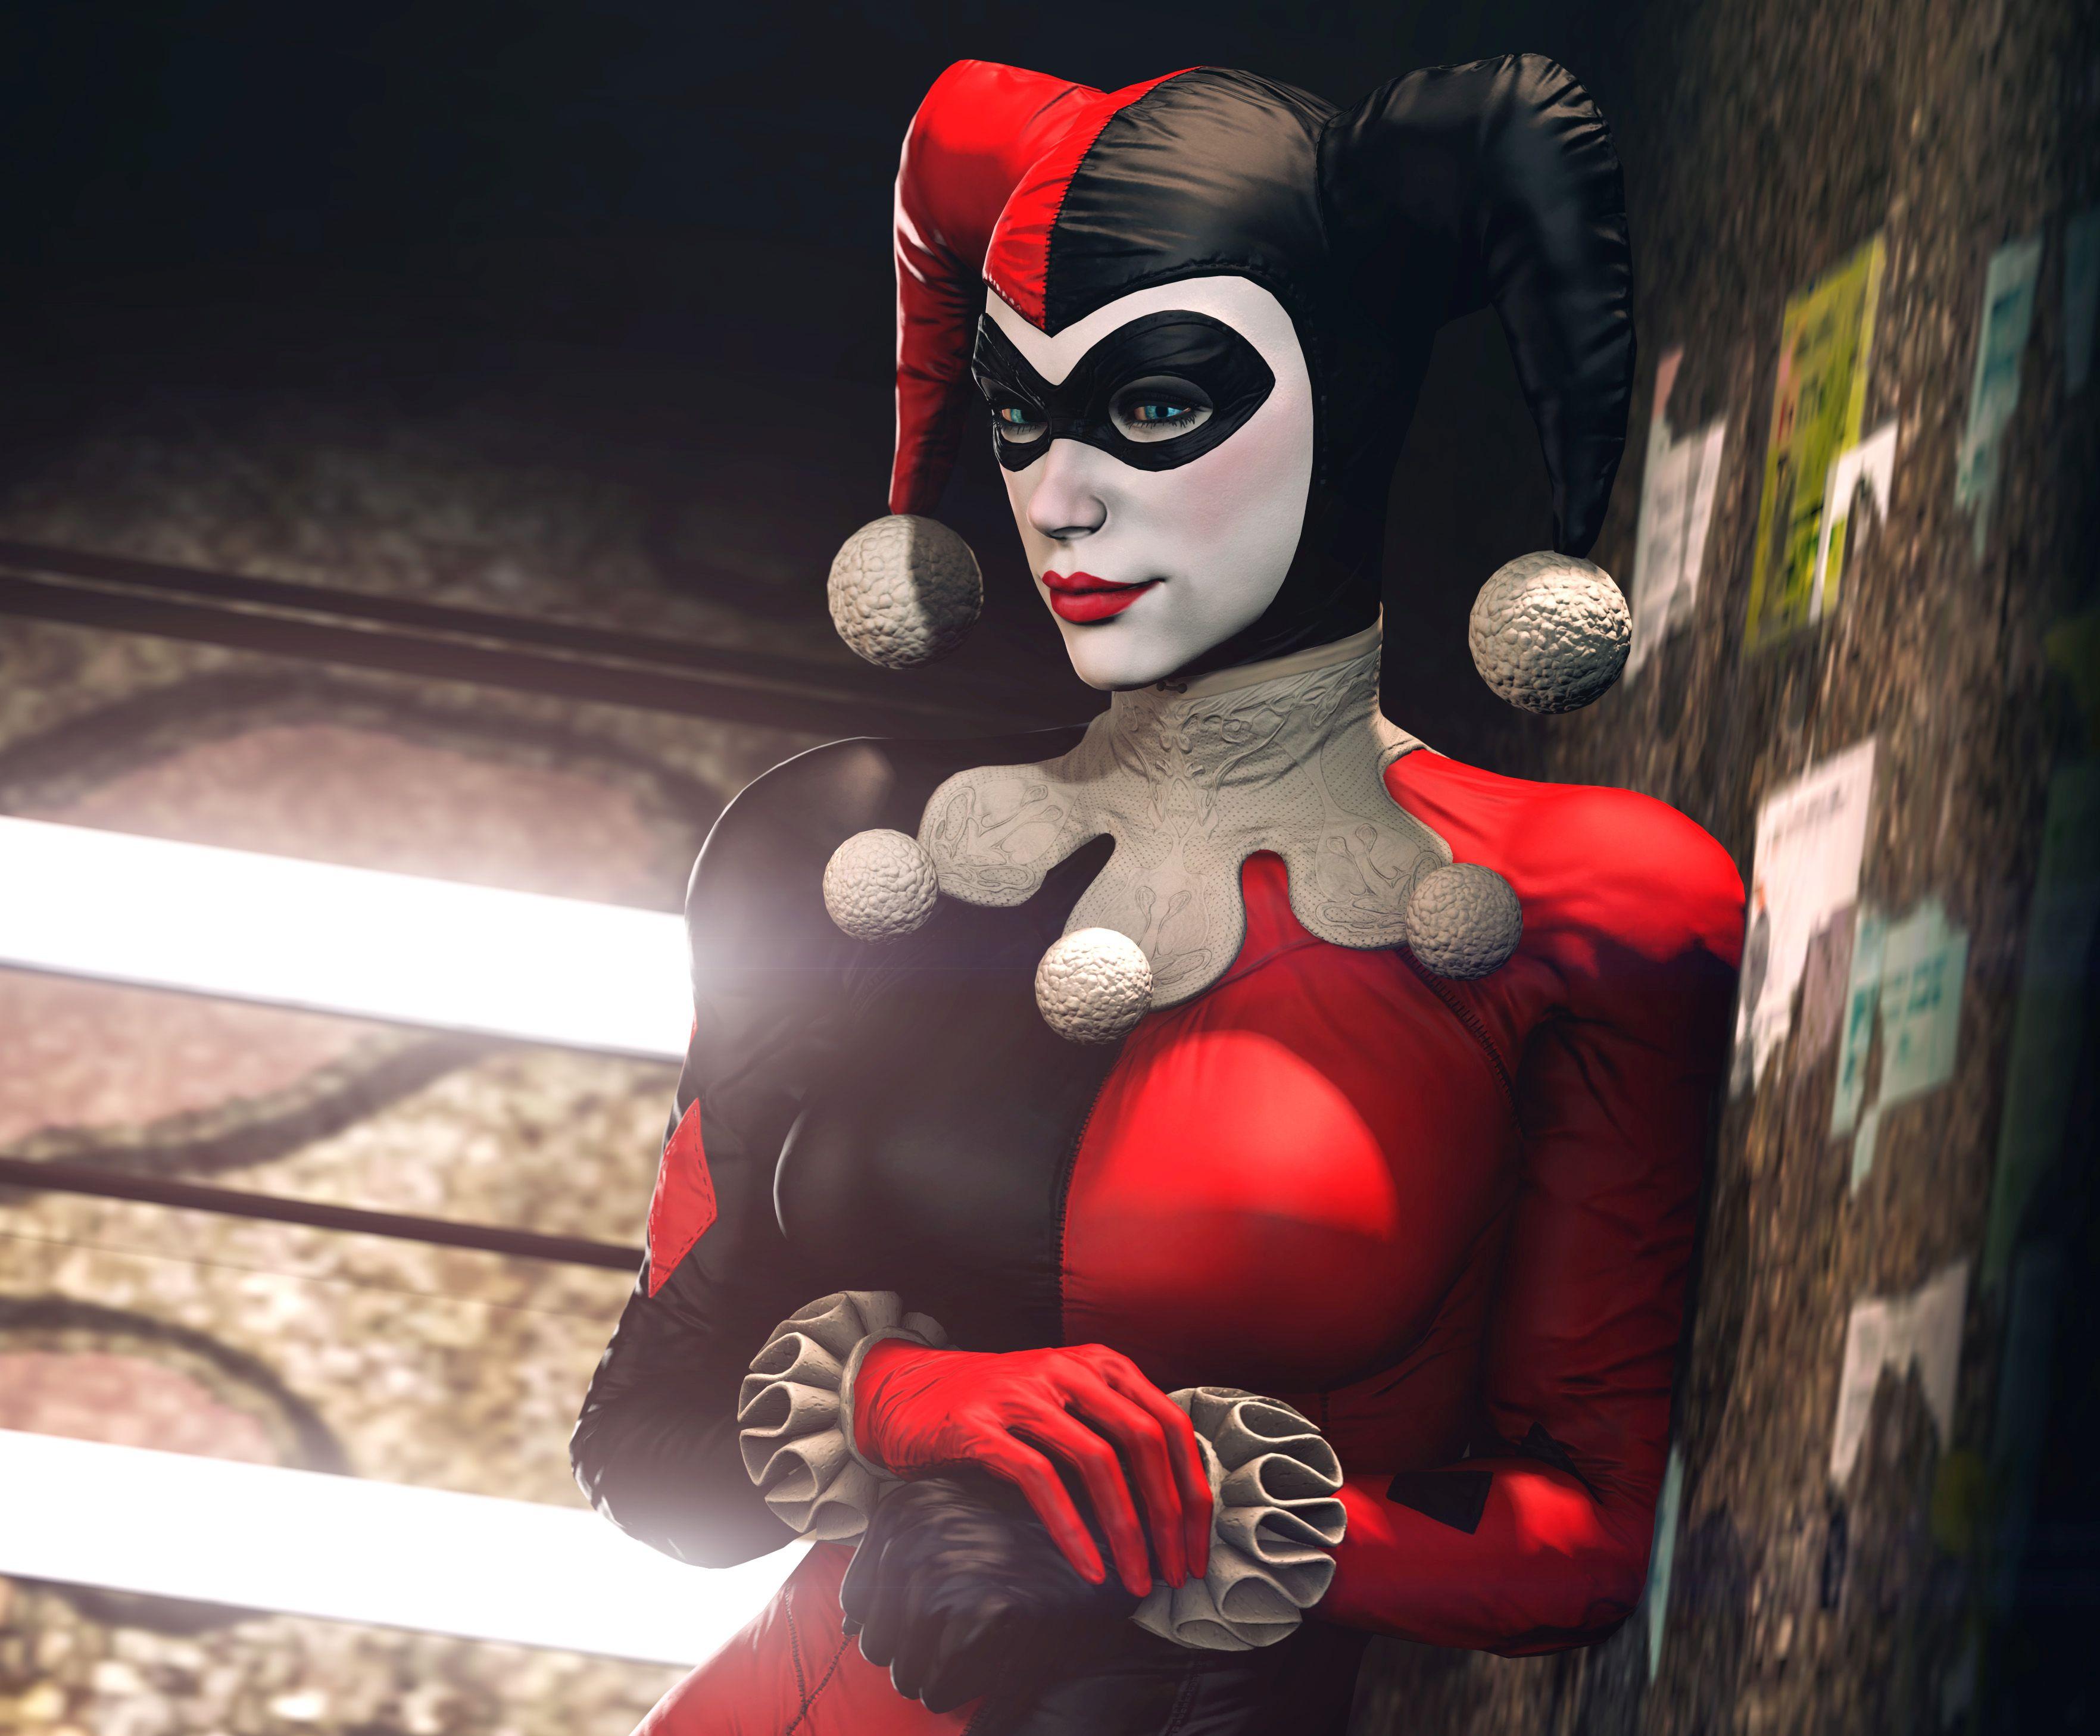 Harley Quinn Batman Arkham Night Hd Games 4k Wallpapers Images